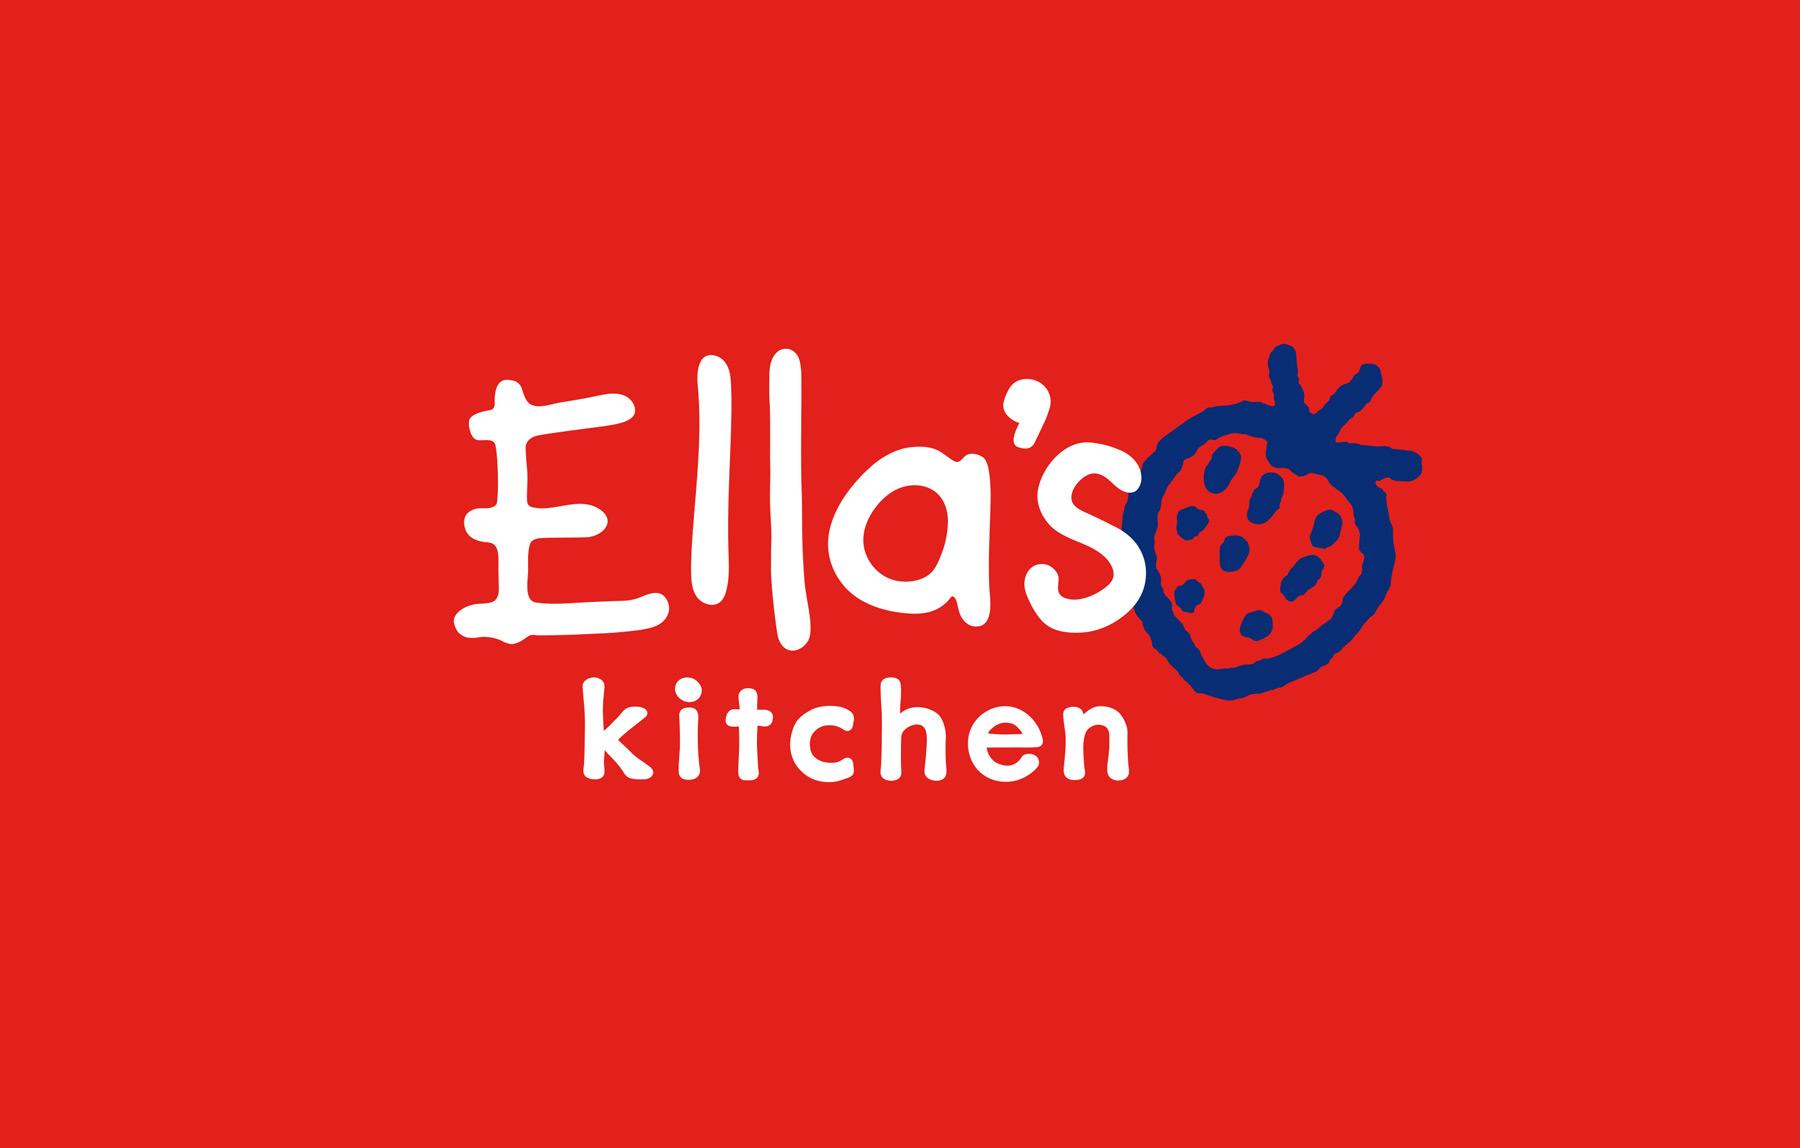 Ella's Kitchen logo design by Biles Hendry